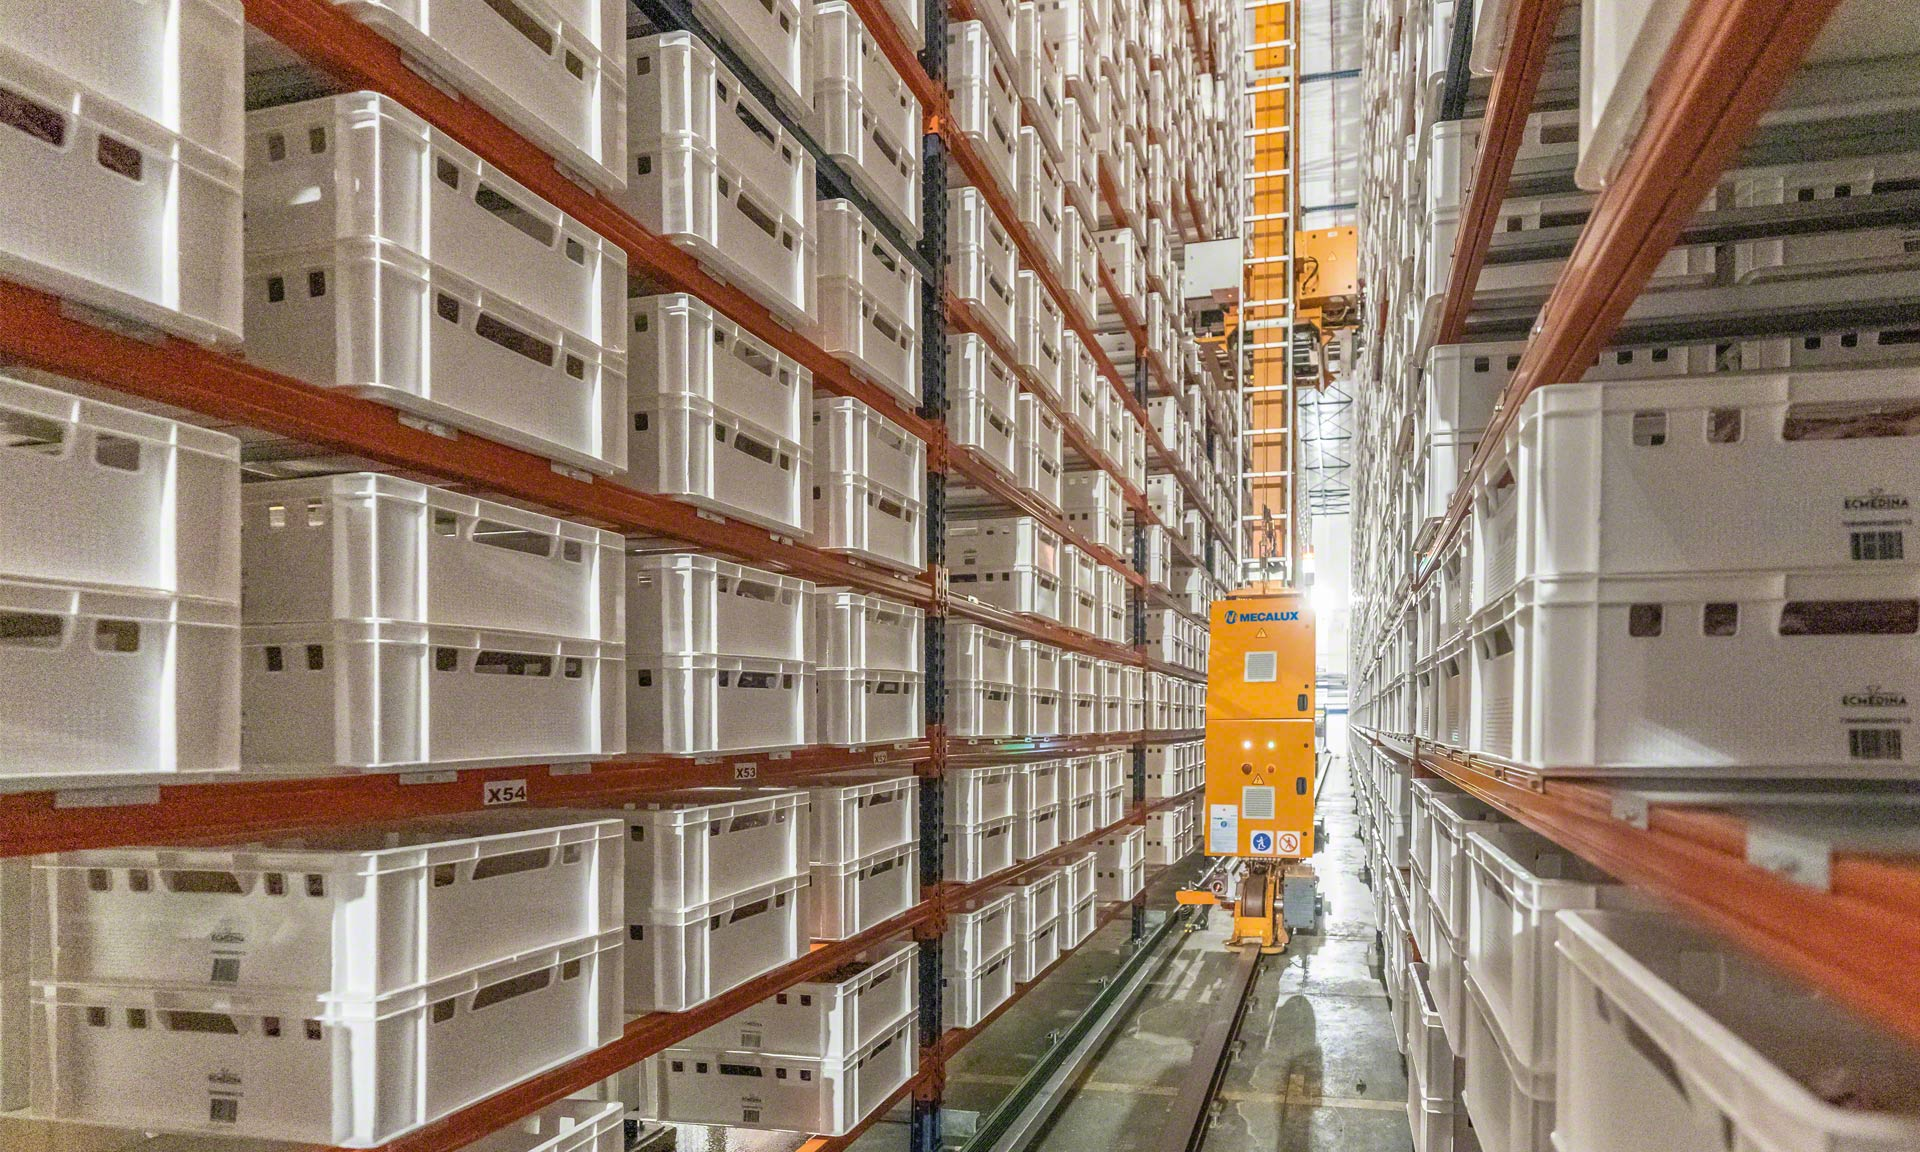 Elaborados Cárnicos Medina : 30 millions de kg/an de viandes dans un bufer automatique